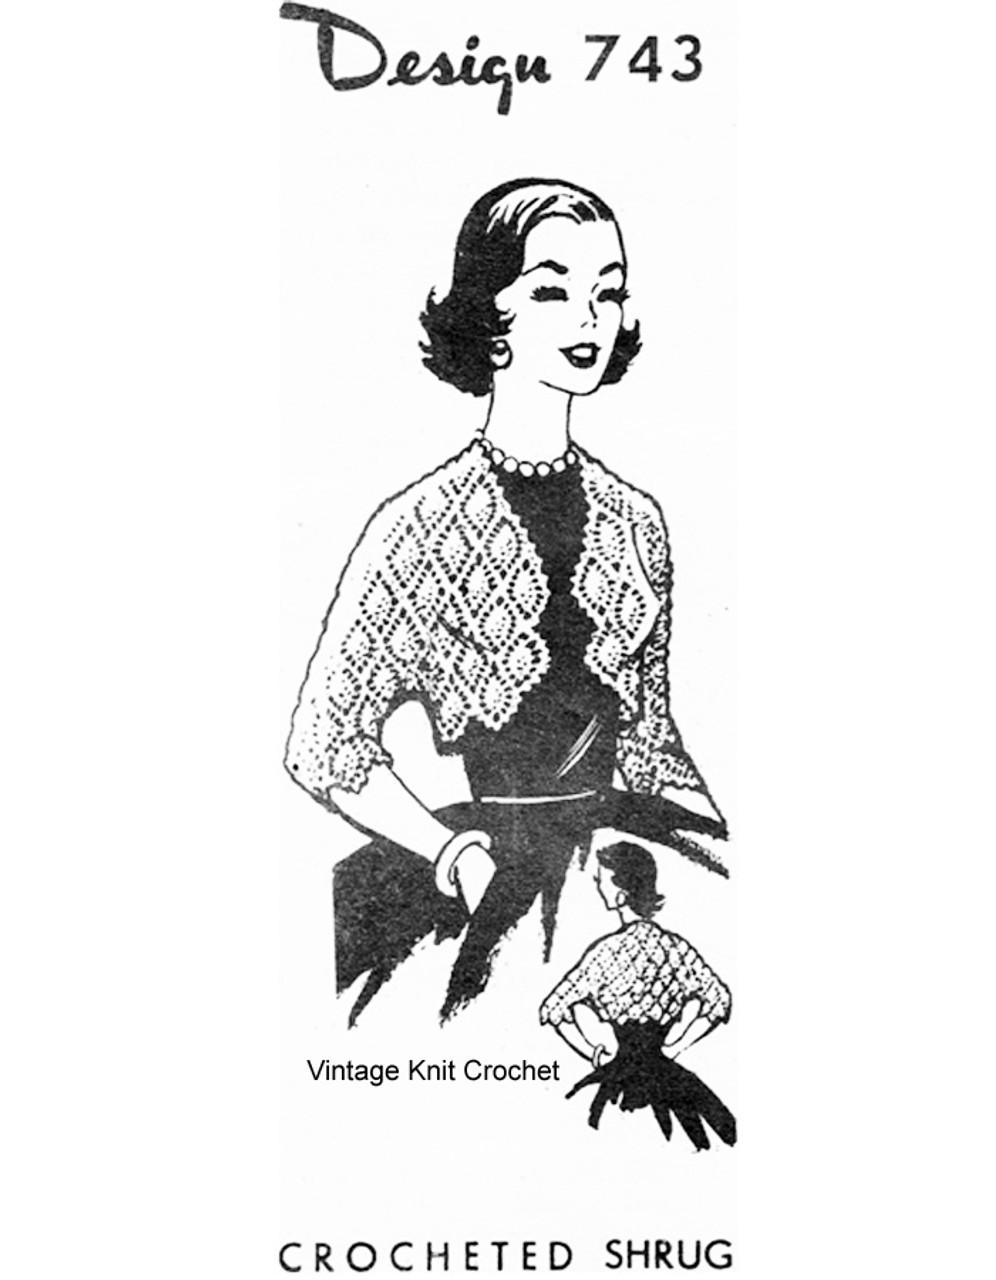 Crochet Shrug Pattern, Pineapple Stitch, Mail Order 743